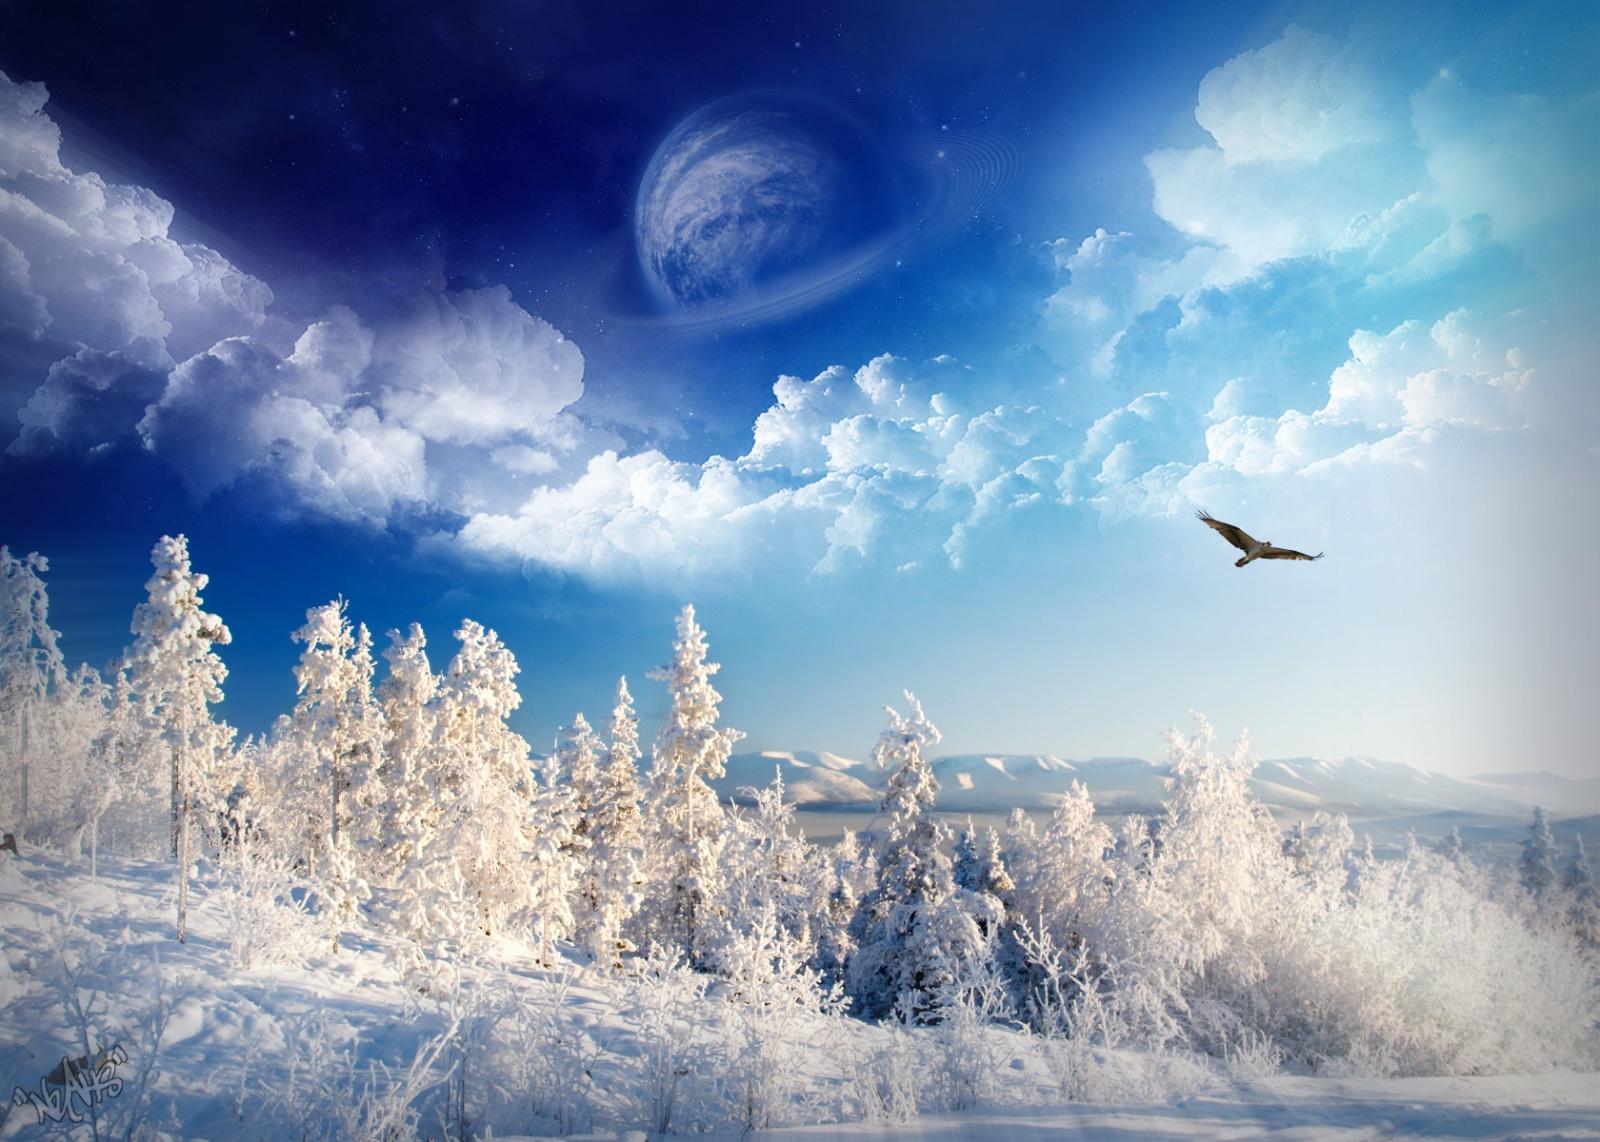 небо, деревья, снег, фото, обои, зима